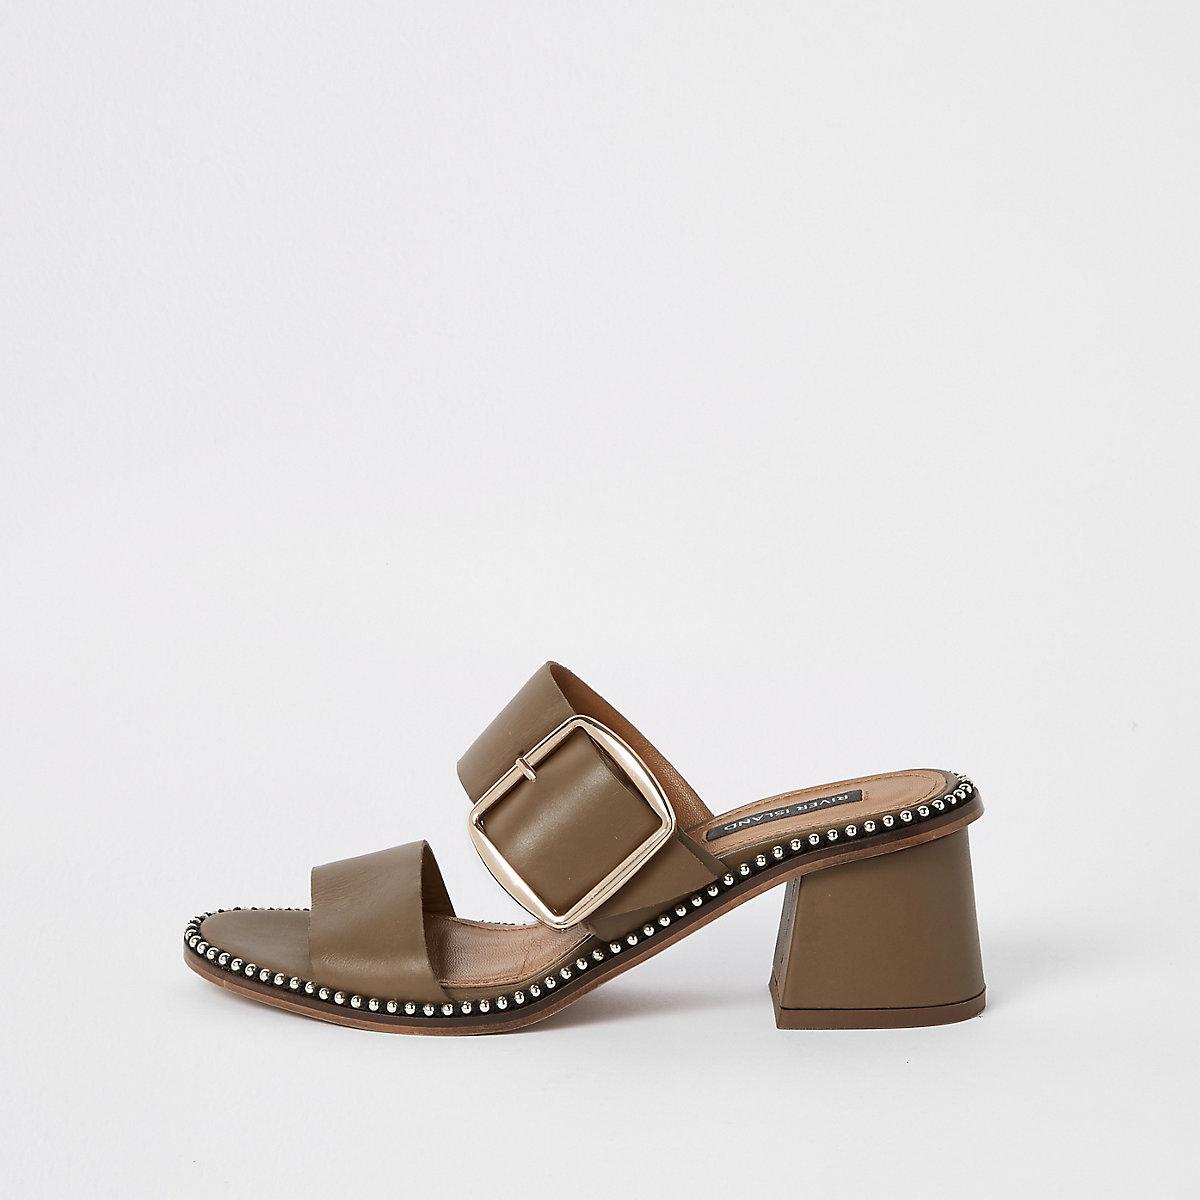 Green leather ball trim block heel mules